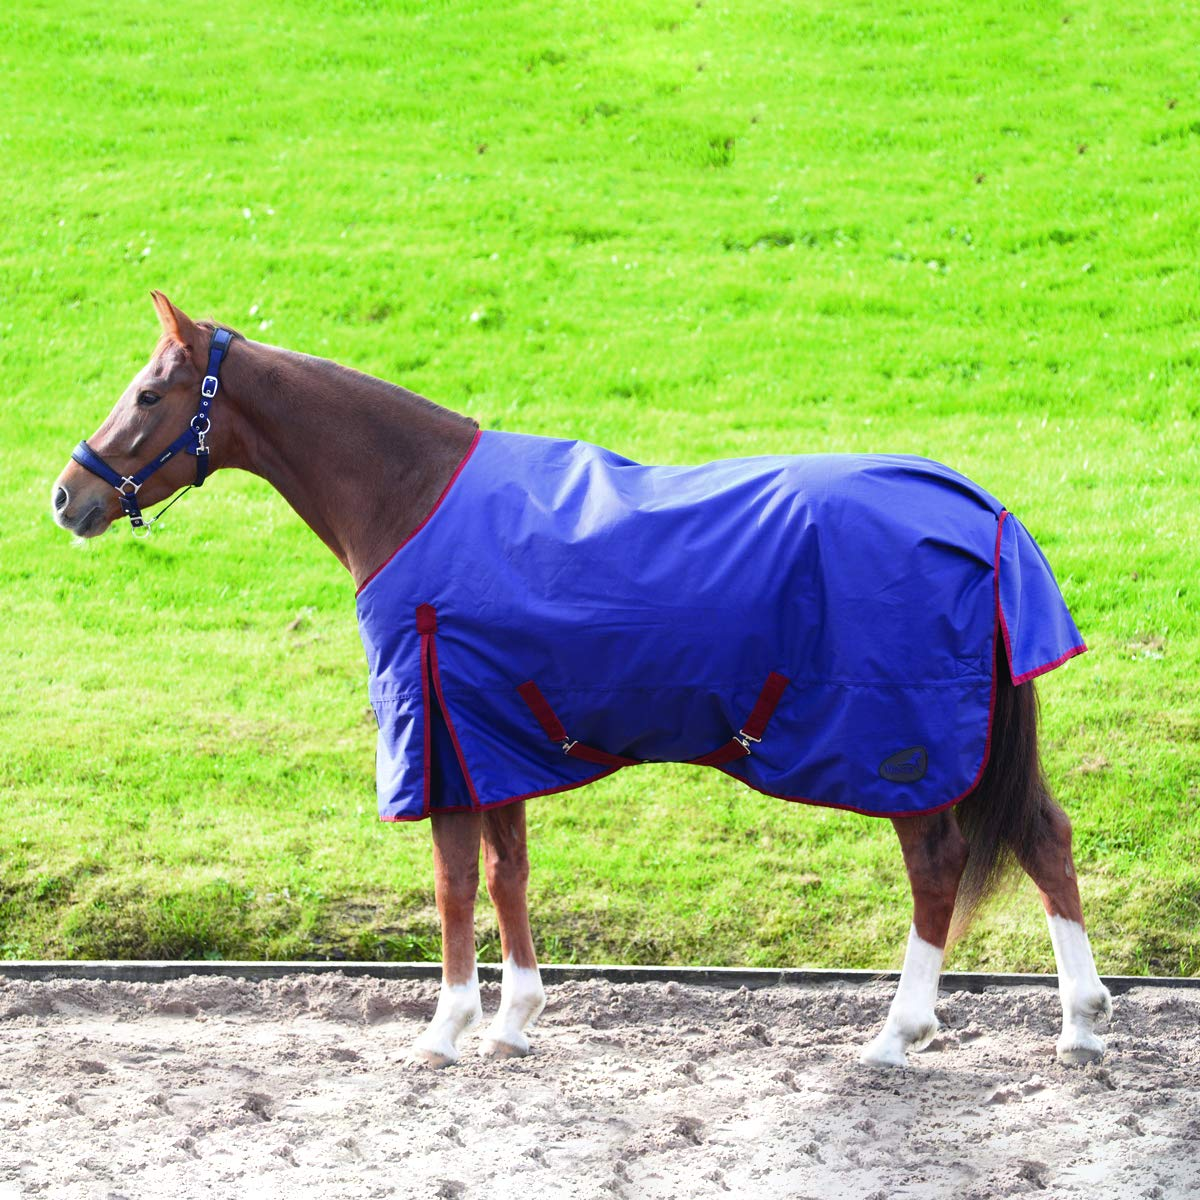 bluee 6 ft 6-Inch bluee 6 ft 6-Inch Masta basics standard neck turnout rug, blanket, 200g